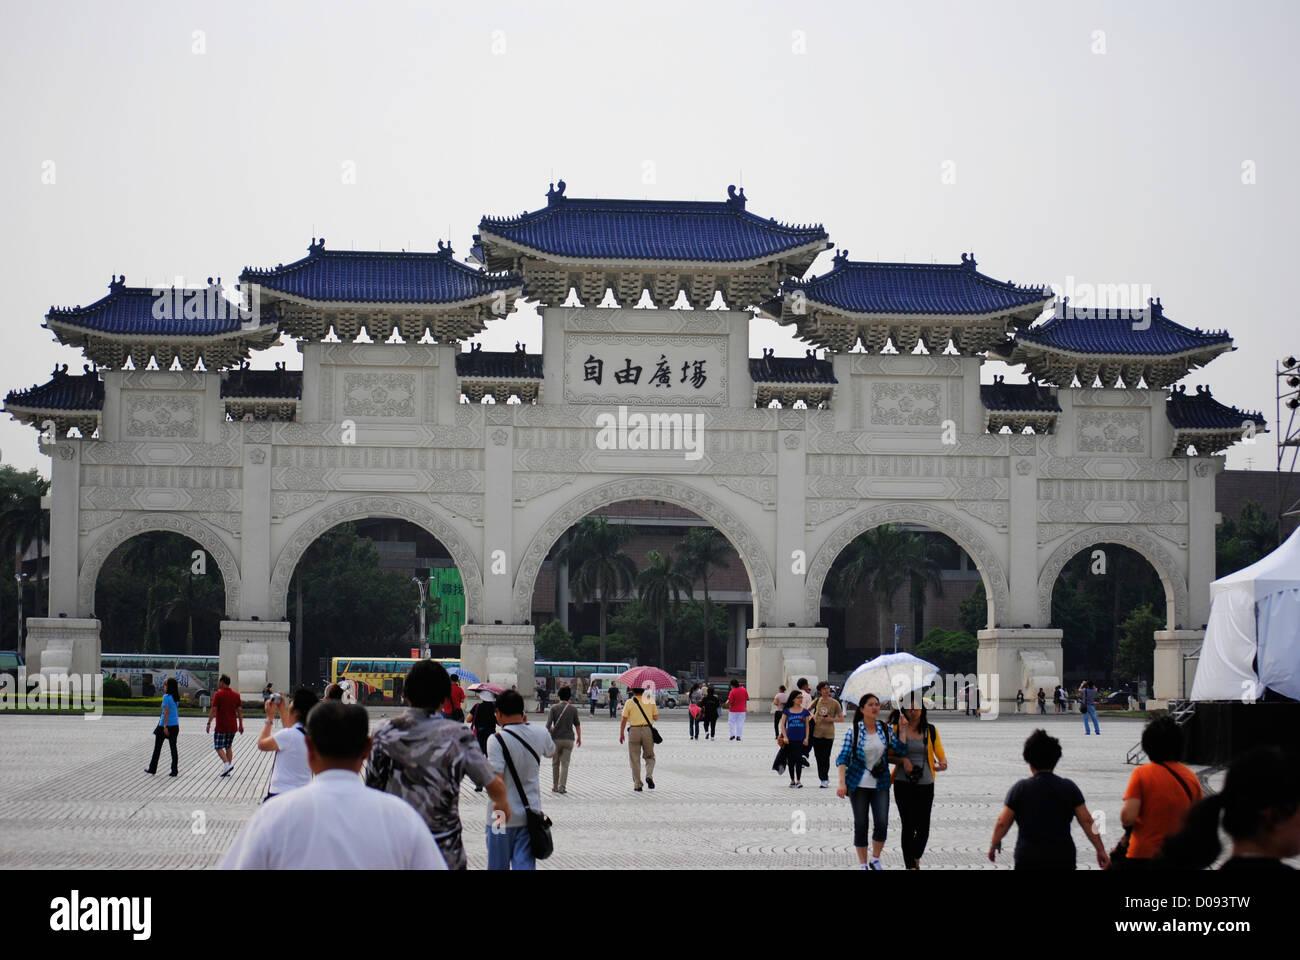 Los turistas en CKS (Chiang Kai Shek Memorial) Taipei Taiwán Imagen De Stock